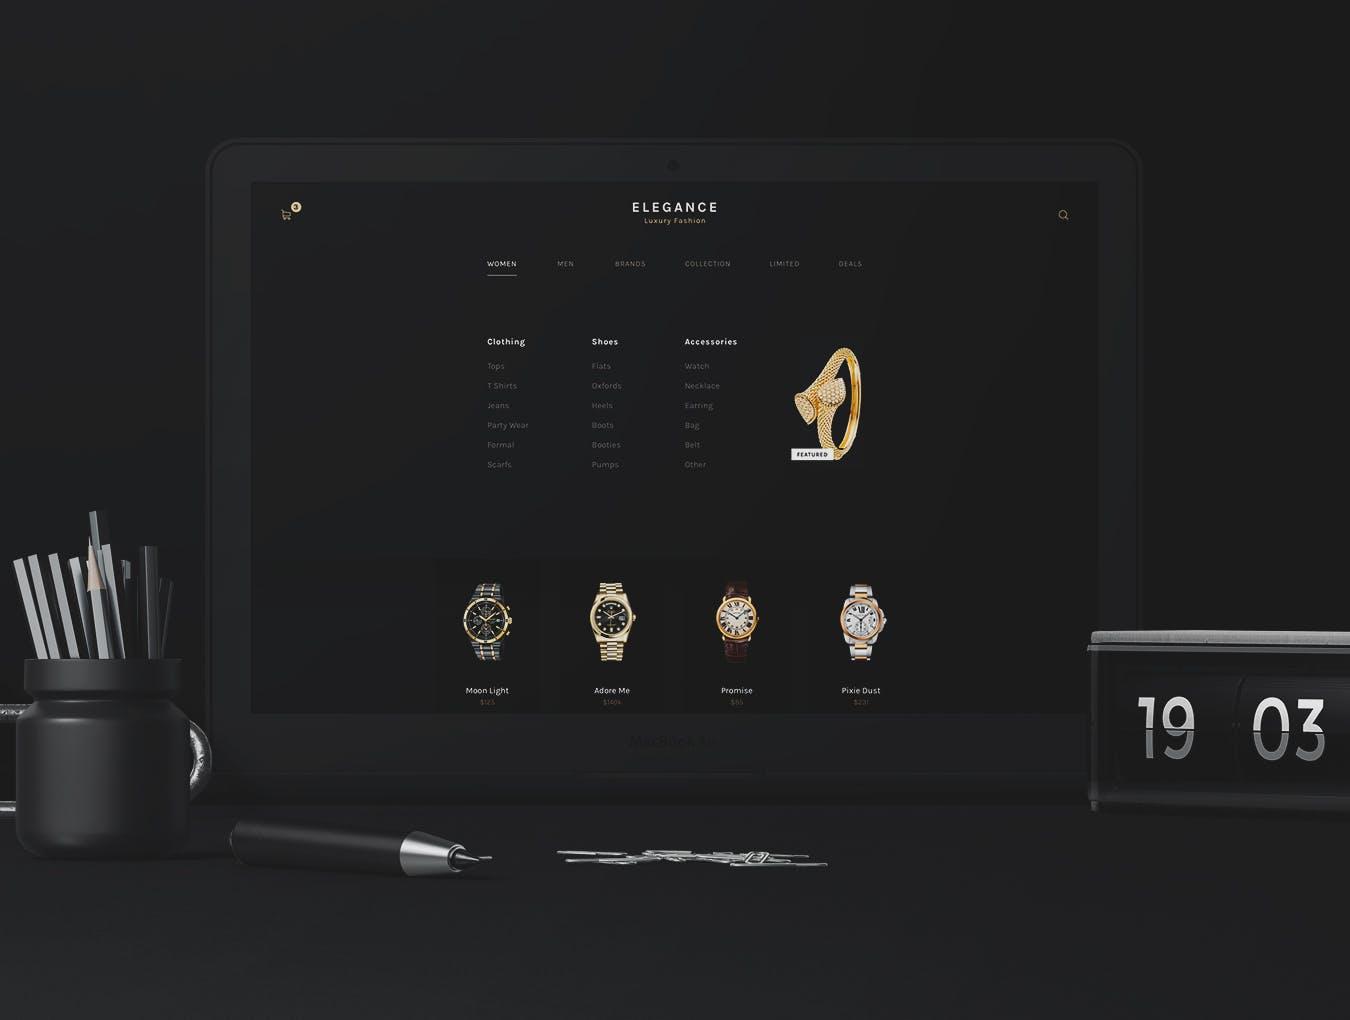 优雅奢华时尚高端APP UI KITS luxury-fashion-ui-kit